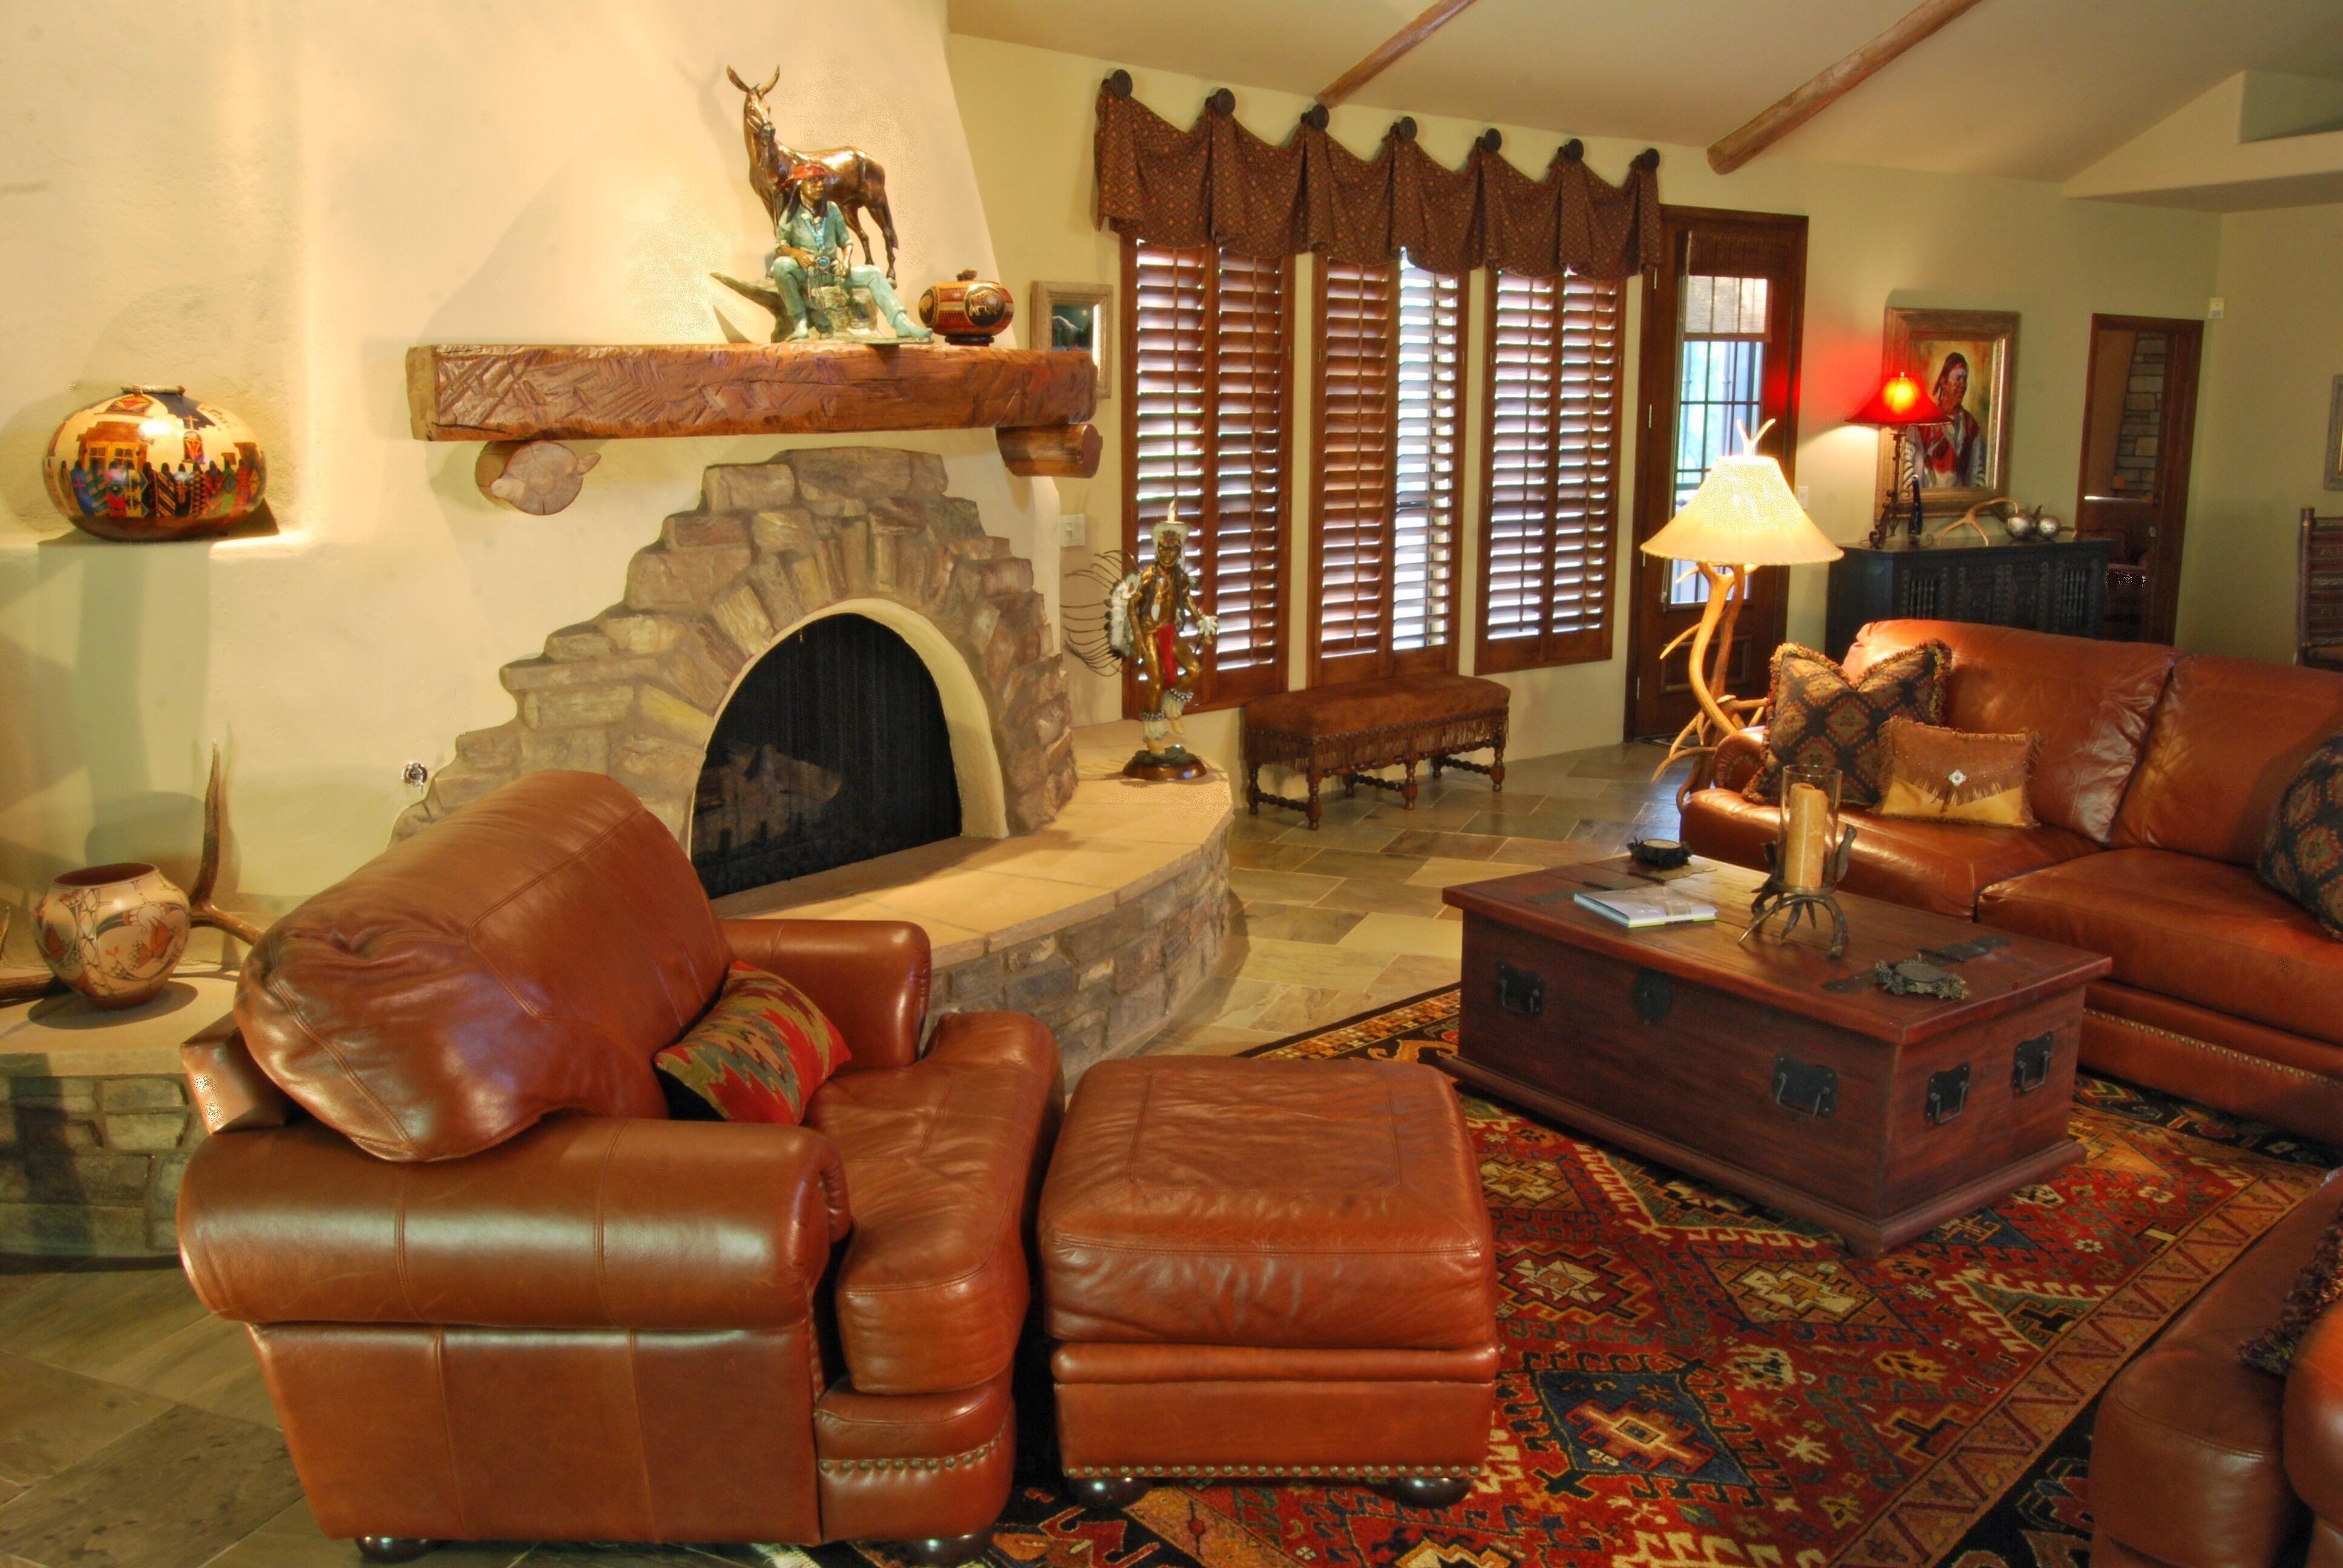 Horseshoe Decor Just For Southwest Homes Southwest Home Decor House Interior Design Living Room Interior Design #southwest #style #living #room